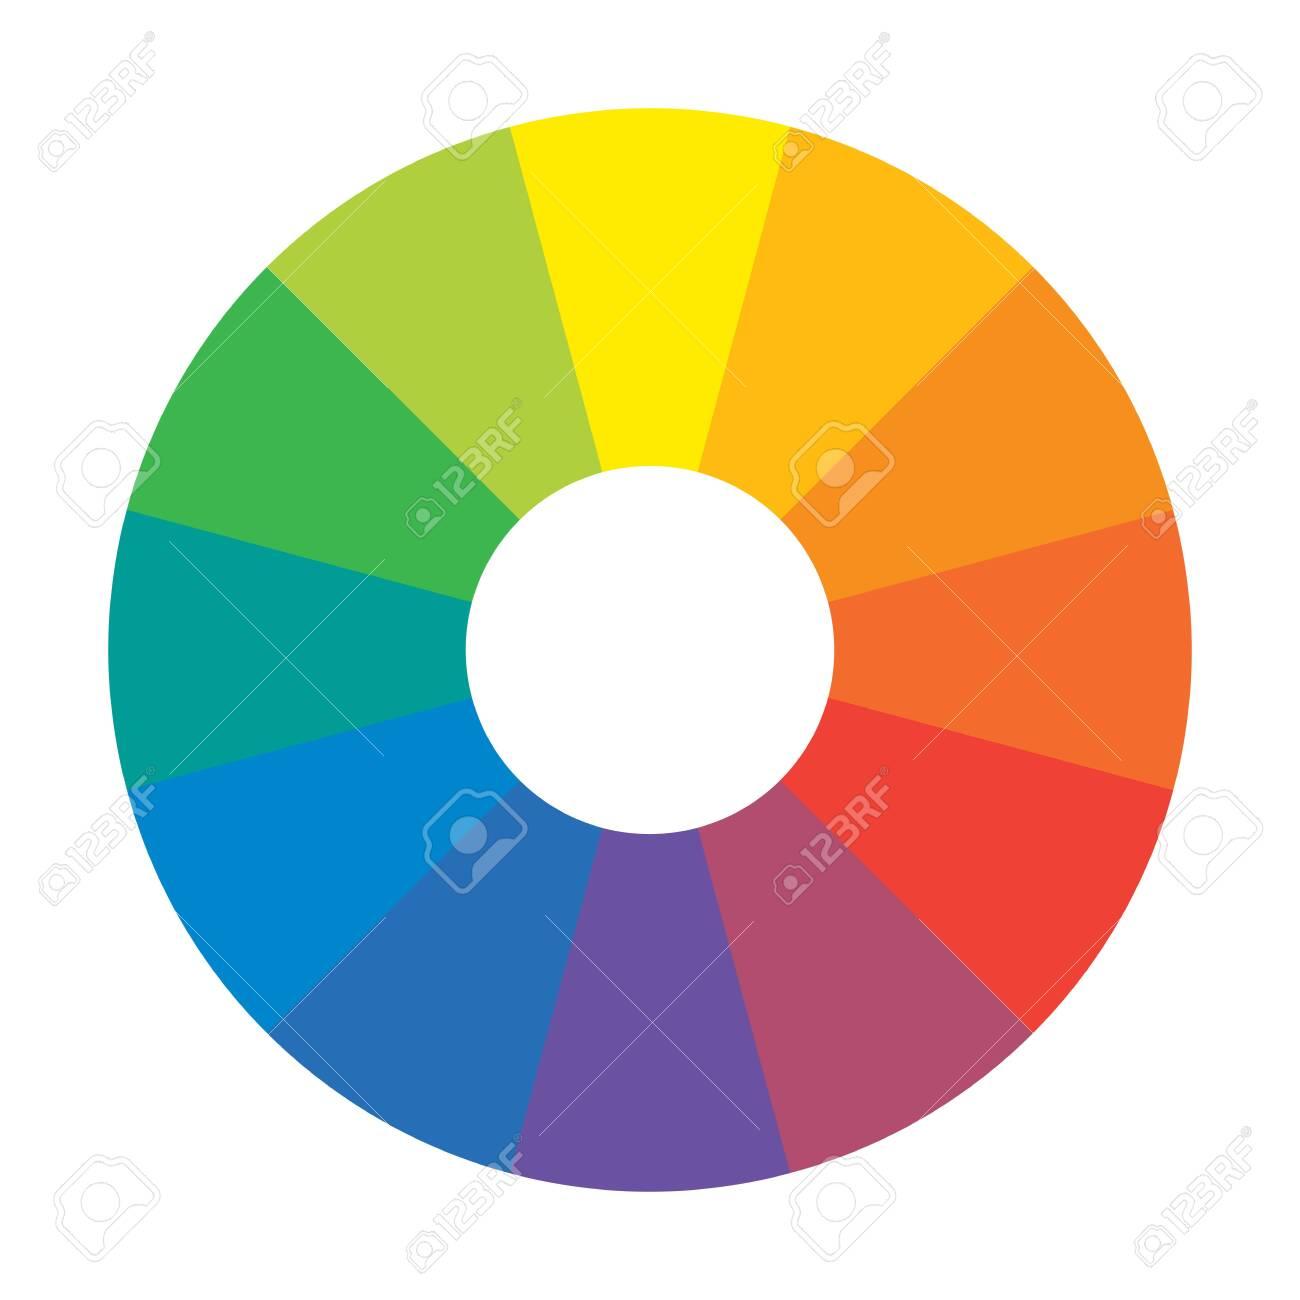 Multicolor Spectral Rainbow Circle of 12 segments. Spectral harmonic palette. - 130453708